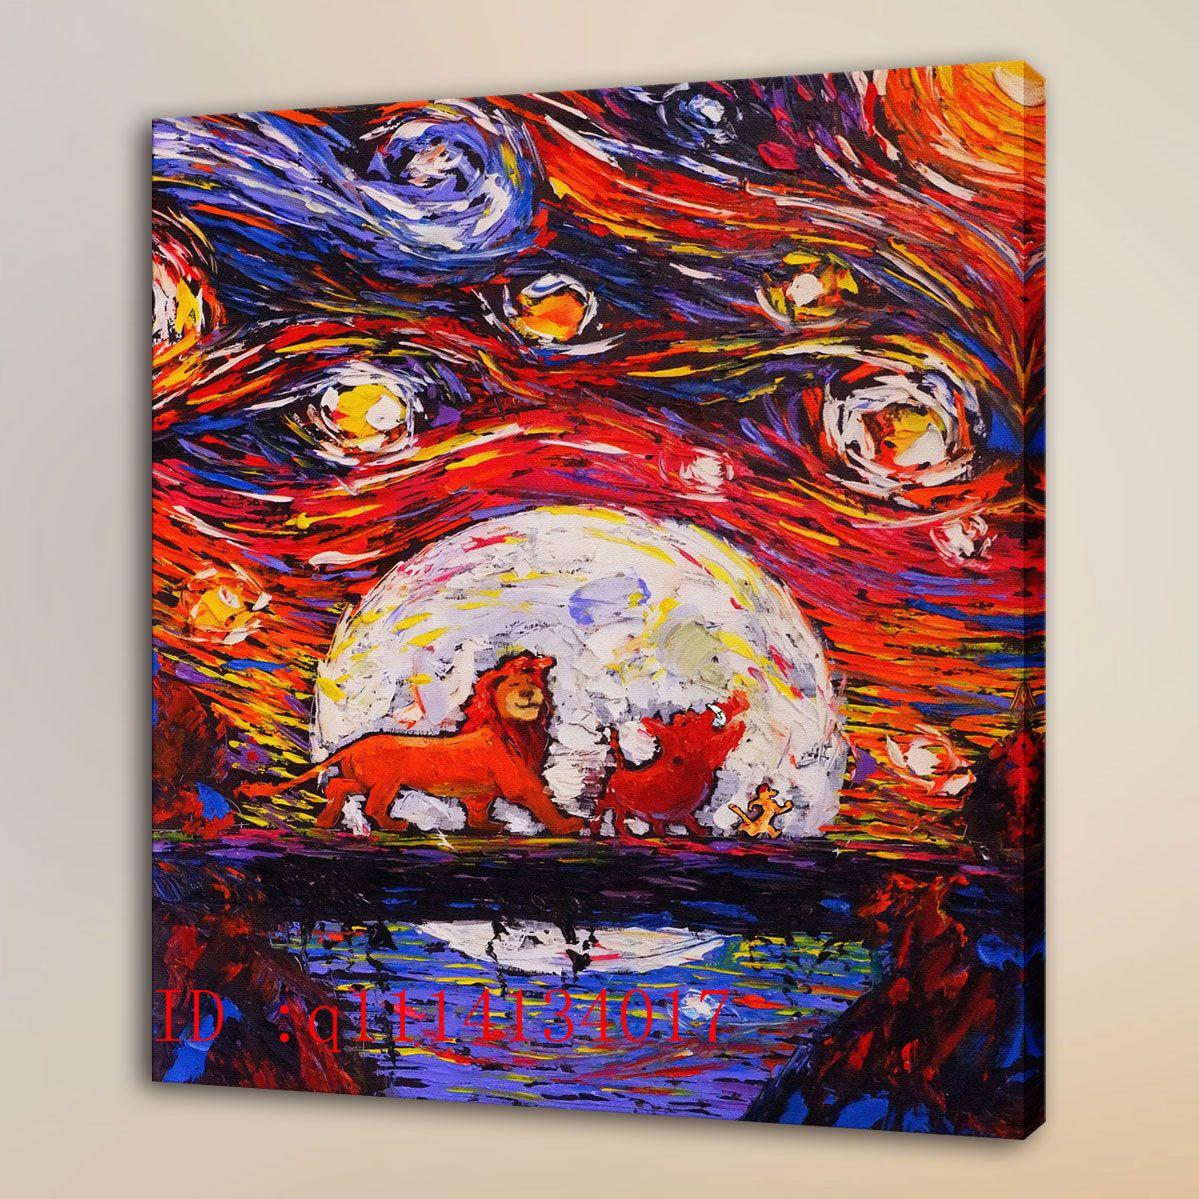 Van Gogh Lion King Simba 4 HD Canvas Prints Wall Art Oil Painting Home Decor Unframed Framed